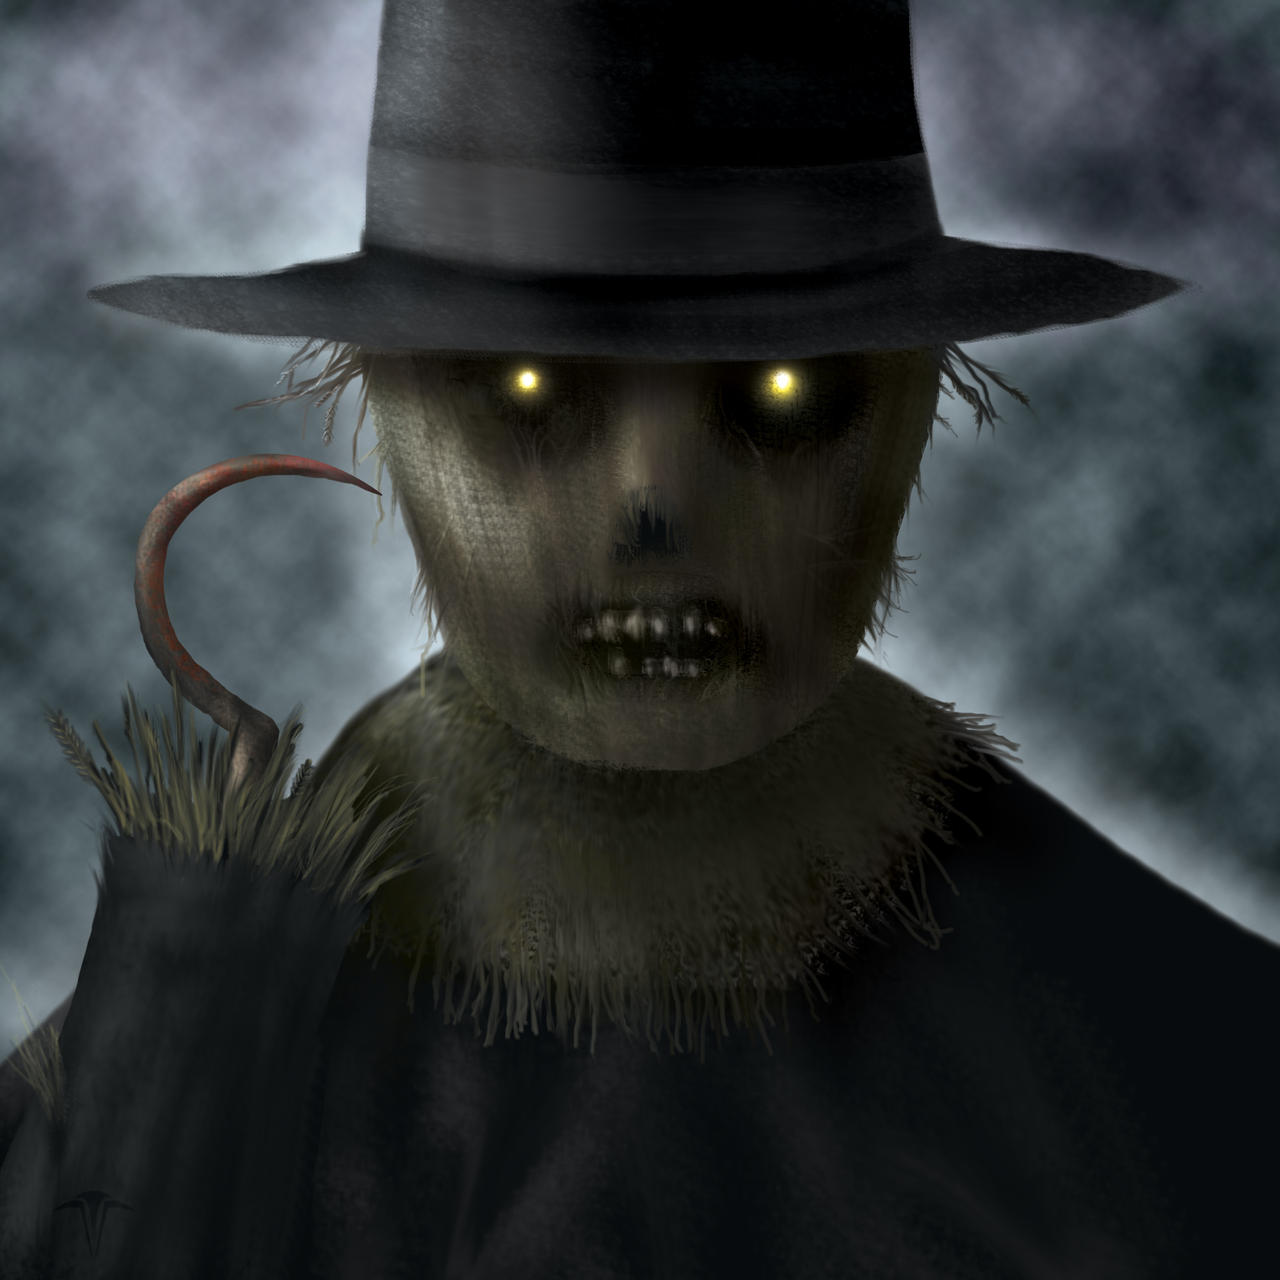 Evil Scarecrow by CagedFreak on DeviantArt